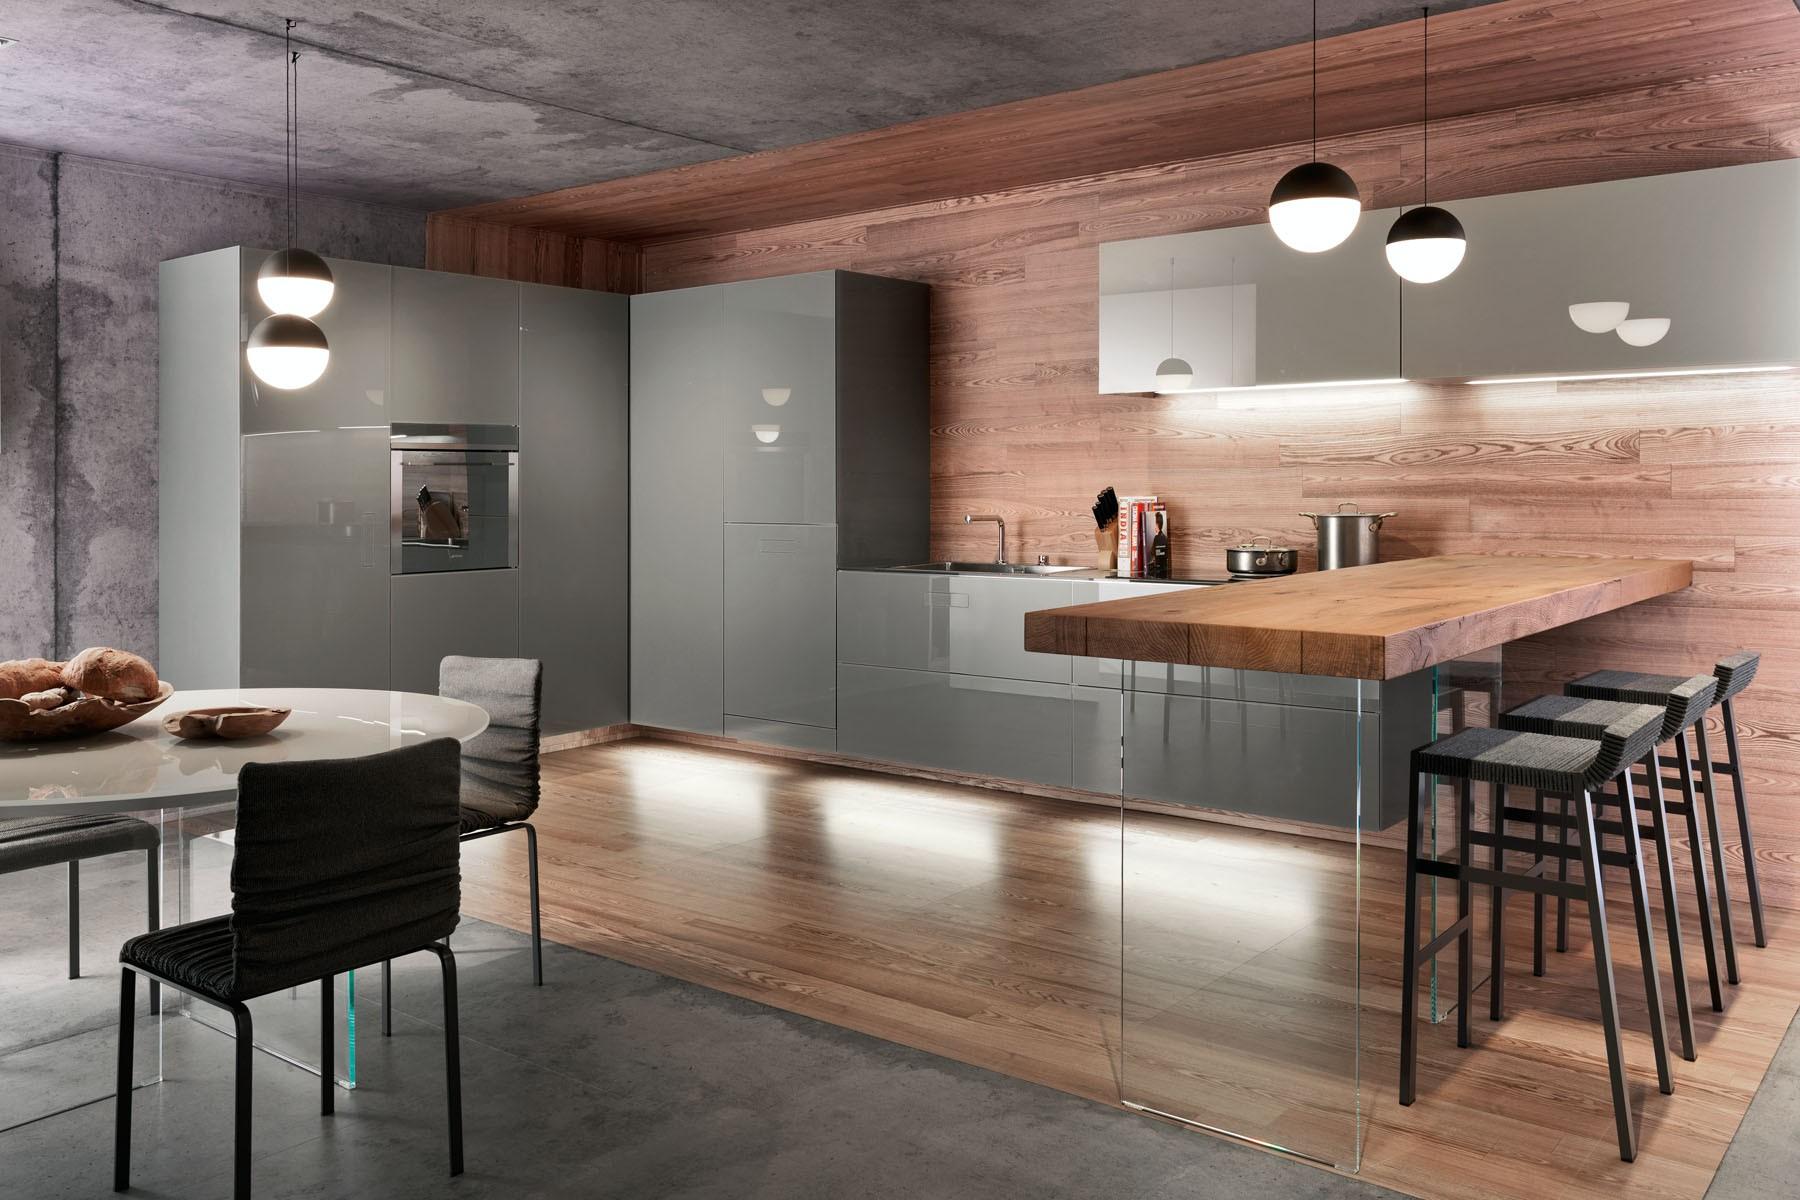 Cucina LAGO 36e8 WildWood  Arredare casa sul Lago di Garda